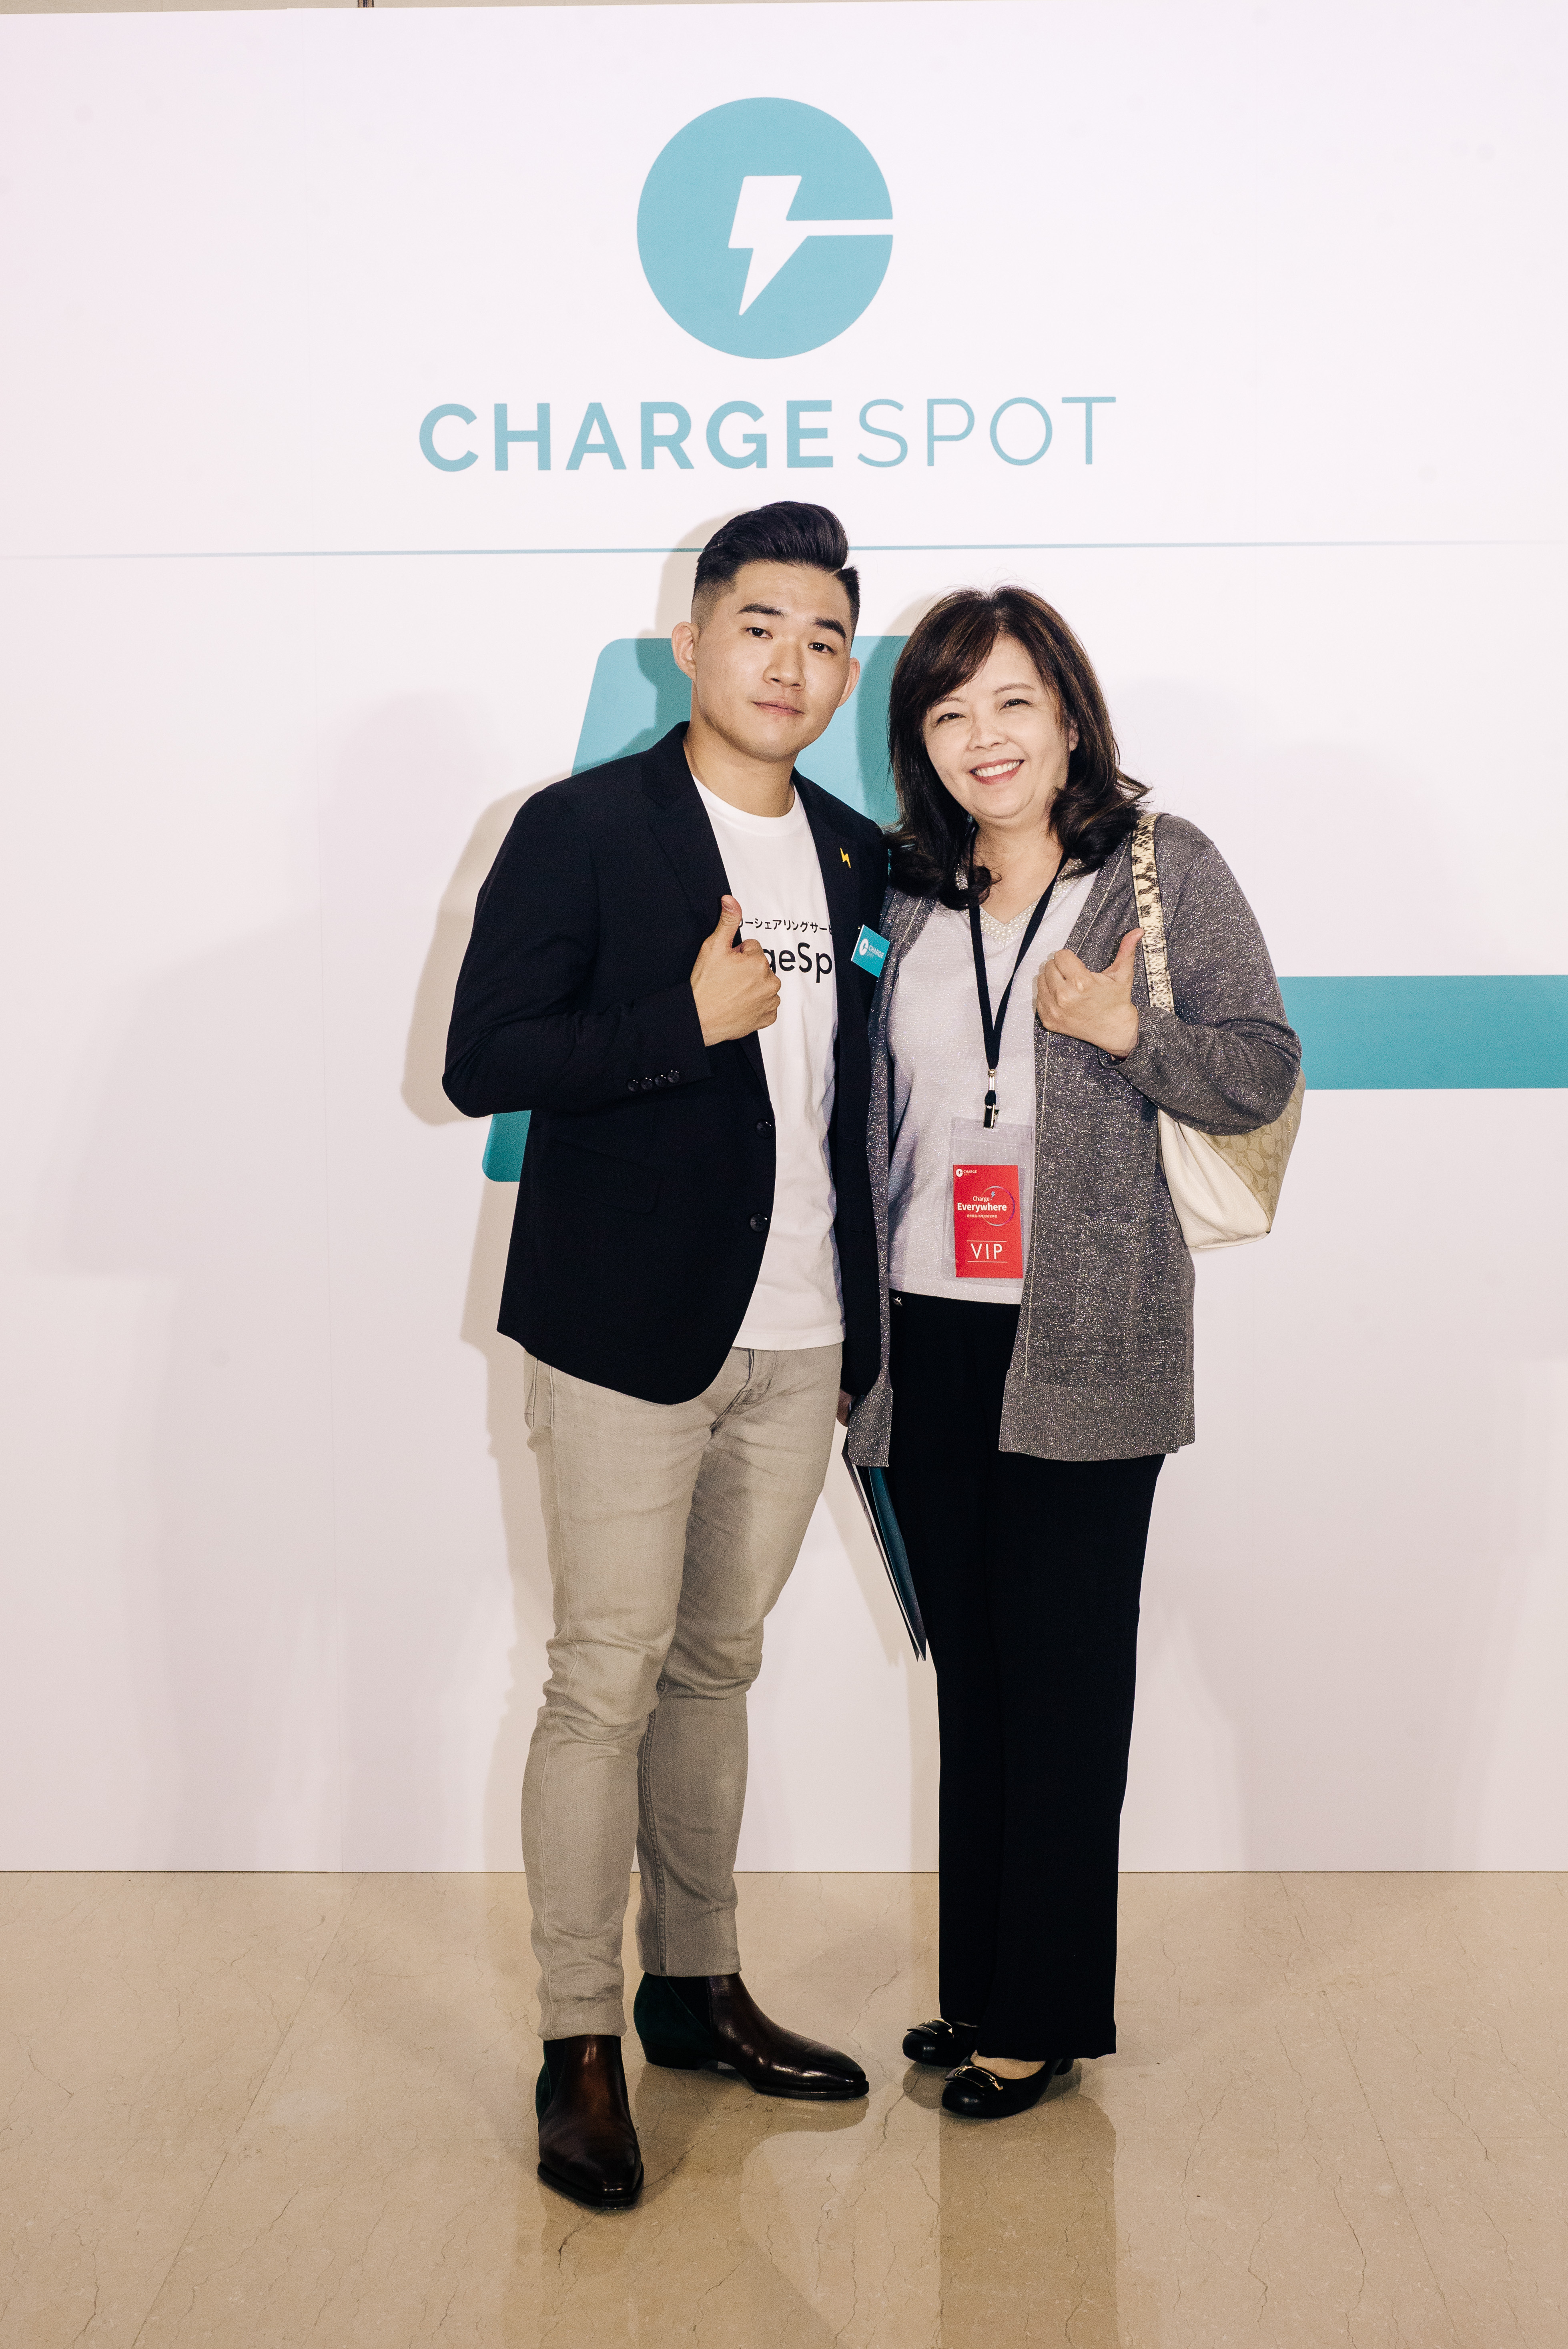 10.30 ChargeSPOT 跨界驚喜 新電亮相 發佈會